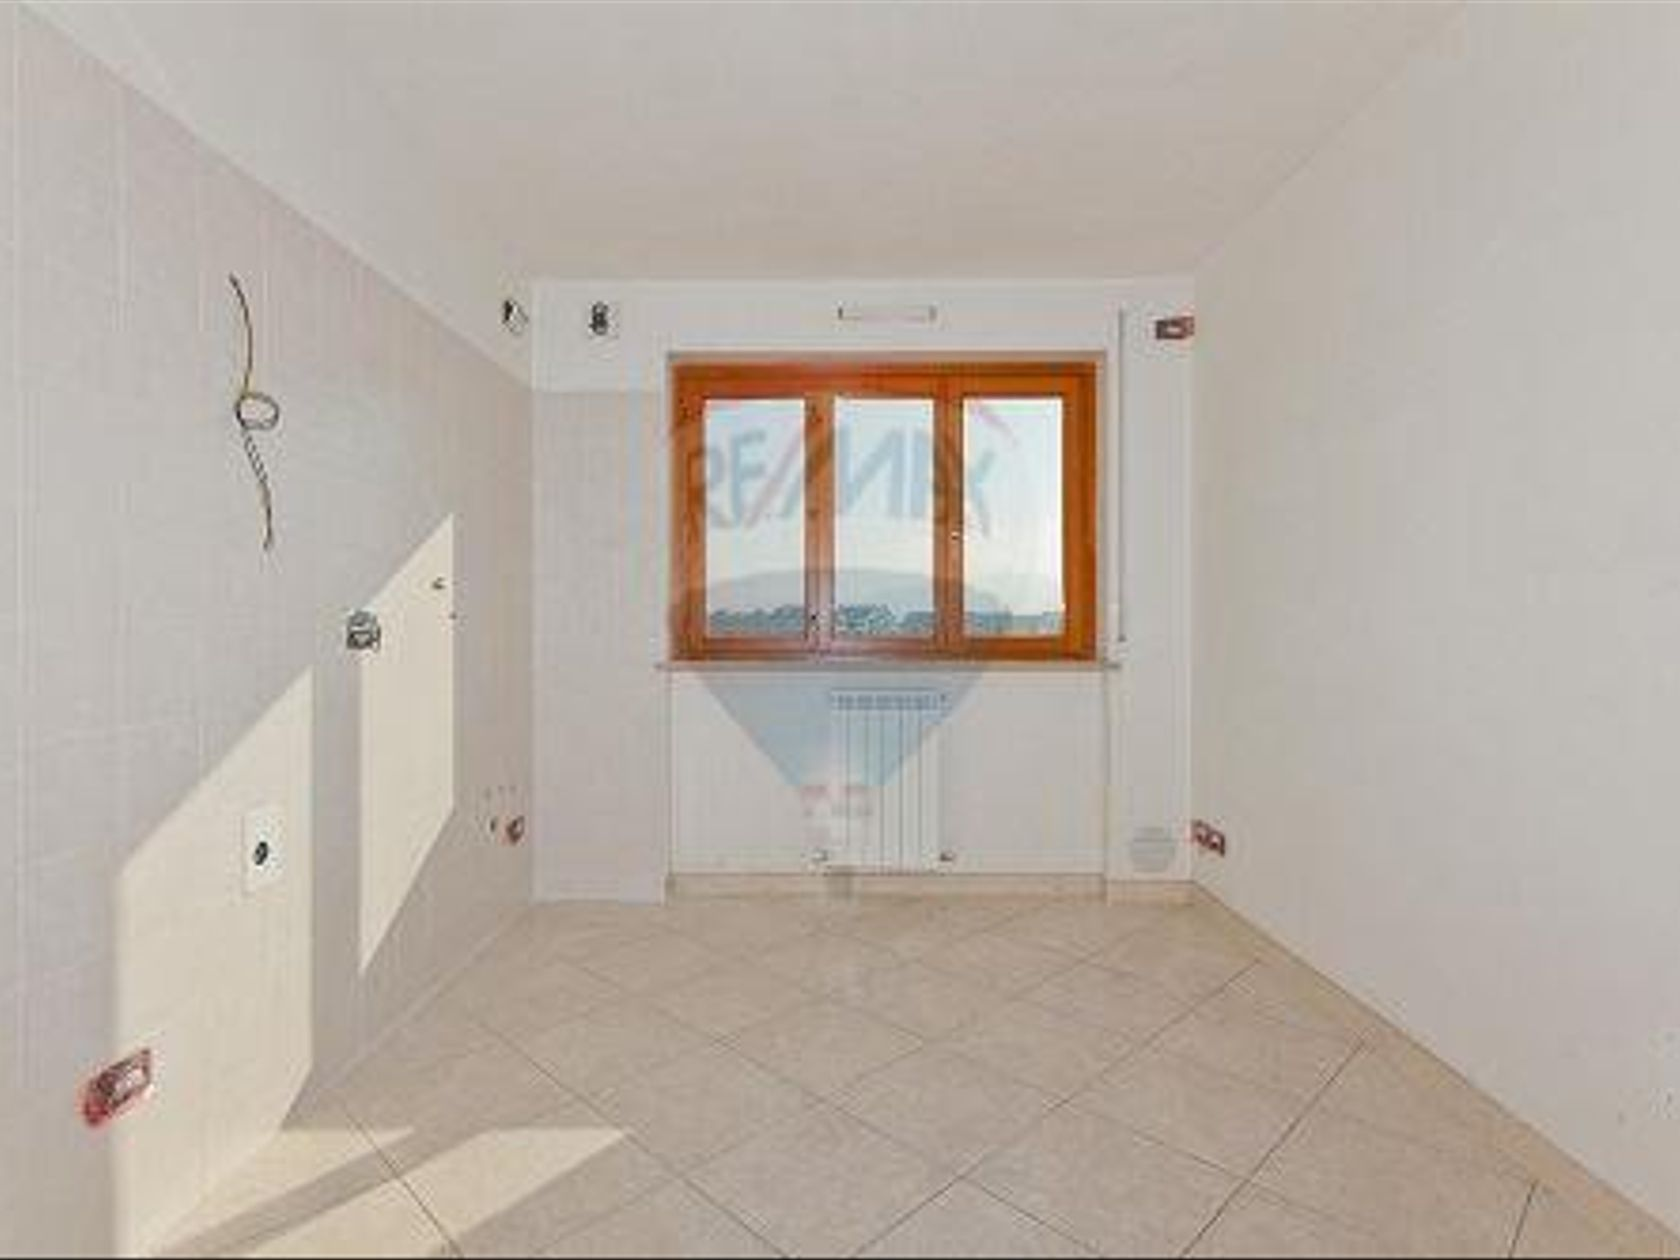 Appartamento Torino-madonna Di Campagna Borgo Vittoria Barrlanz, Torino, TO Vendita - Foto 7